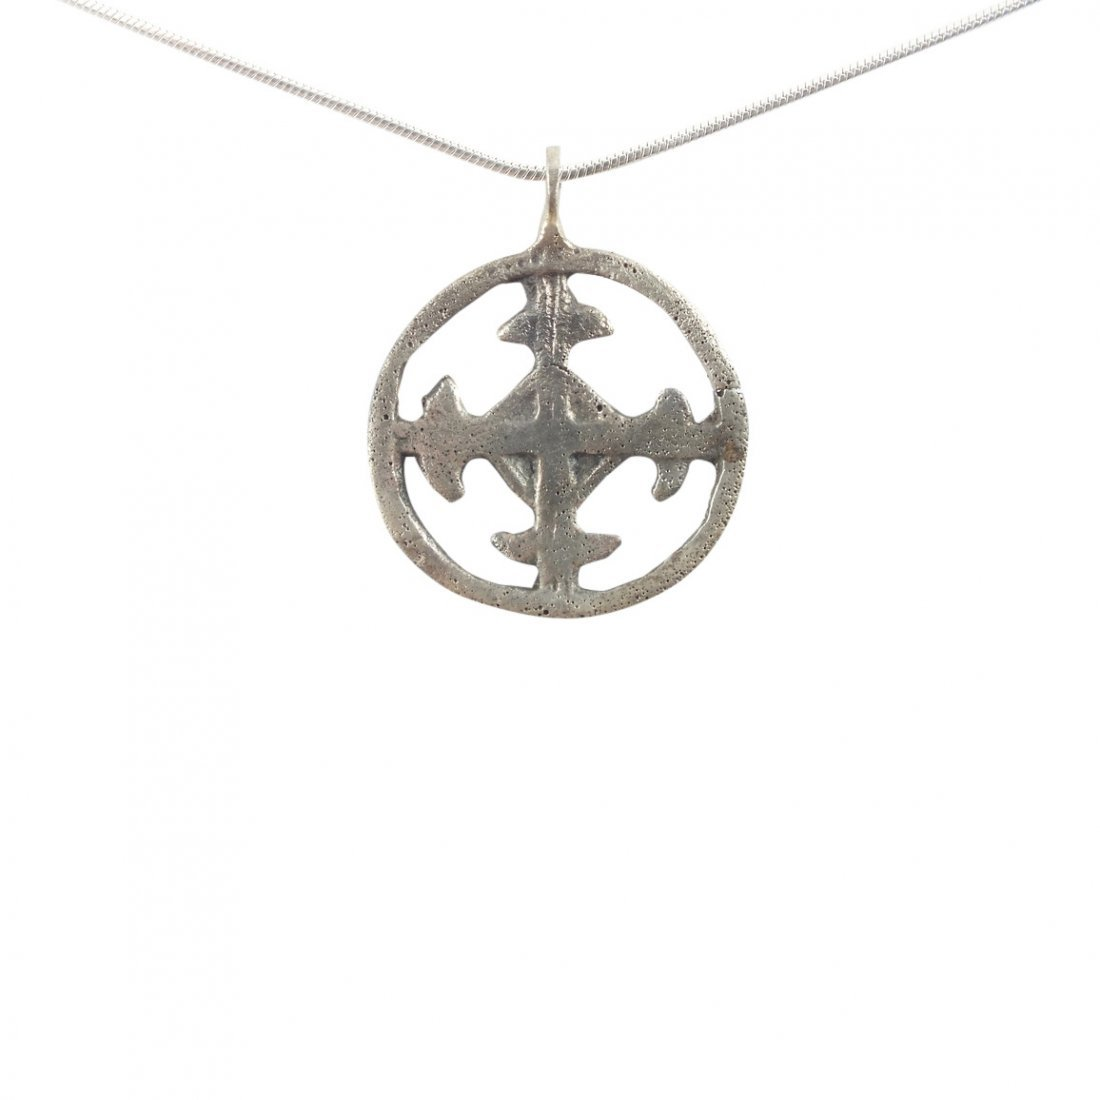 Crusader's Cross Pendant 11th-13th Centuries